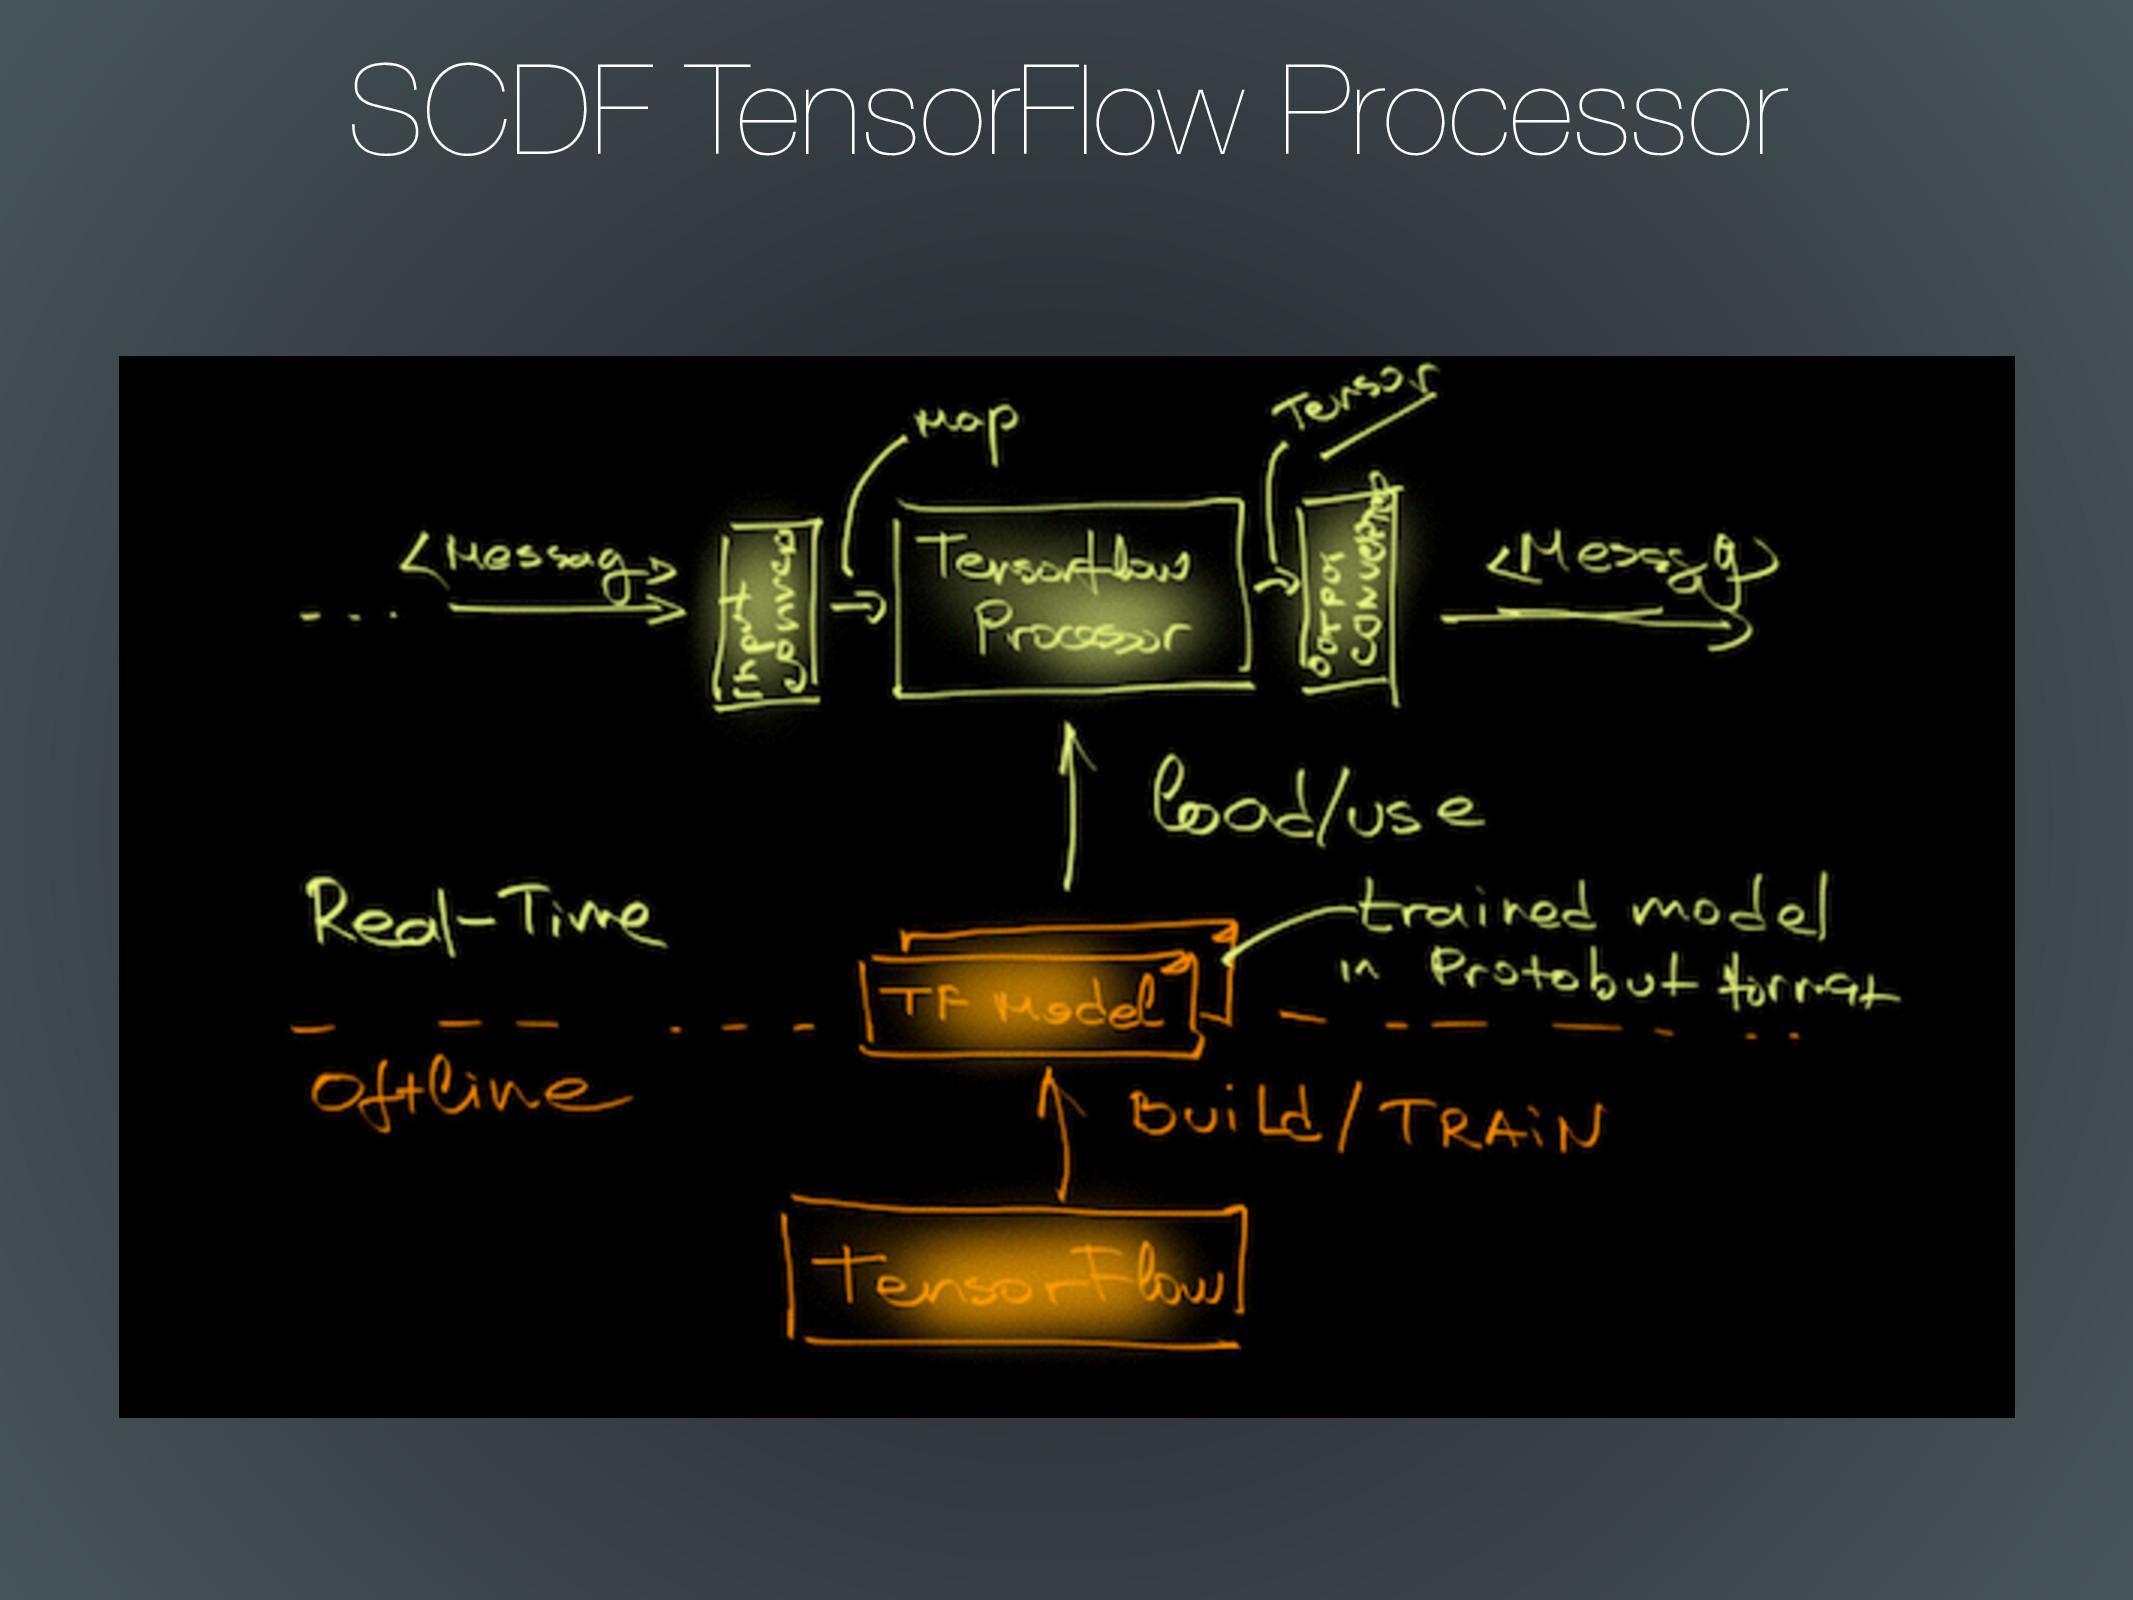 SCDF TensorFlow Processor